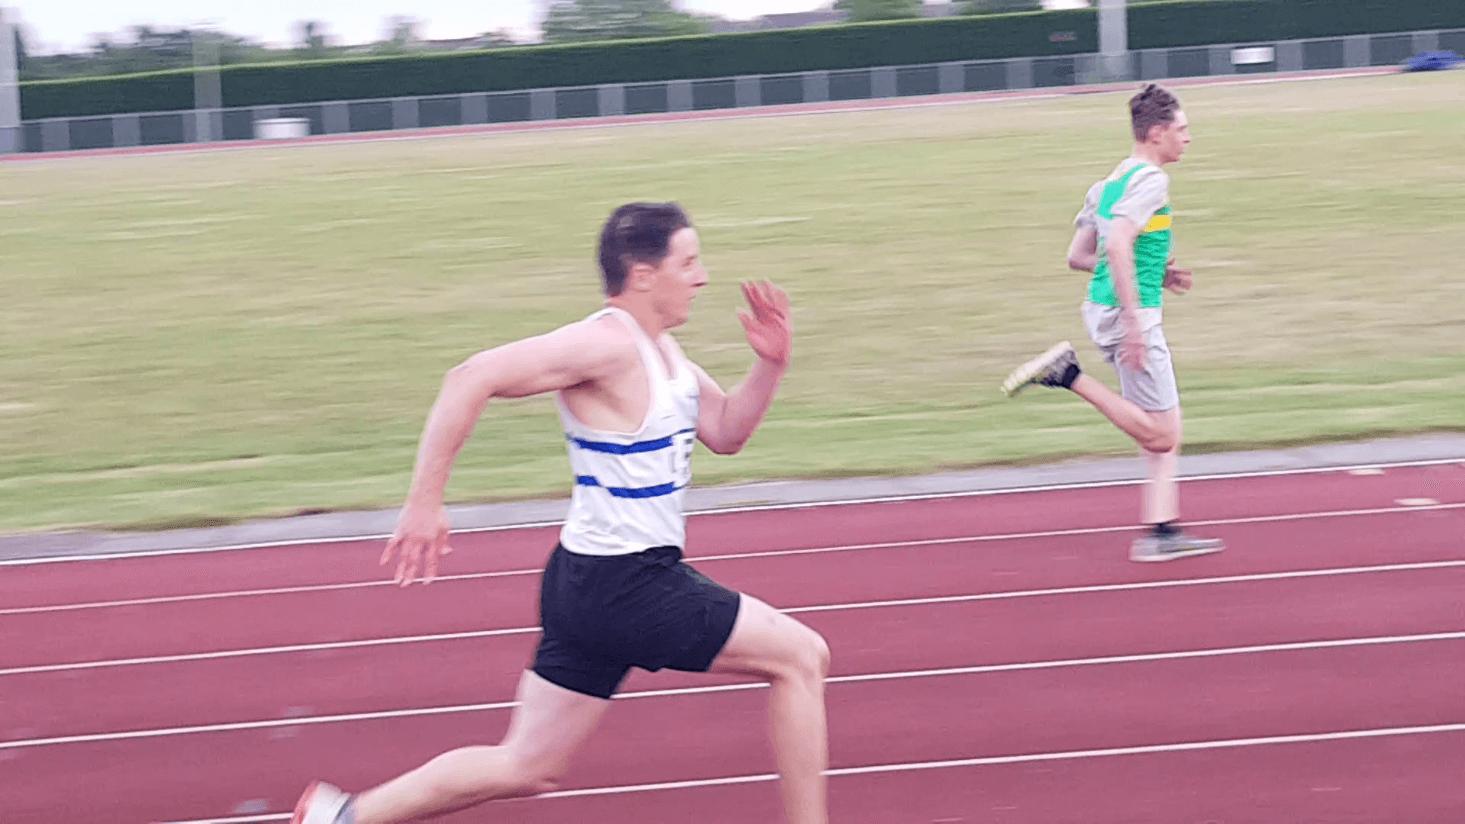 Luke sprinting towards the finish line.